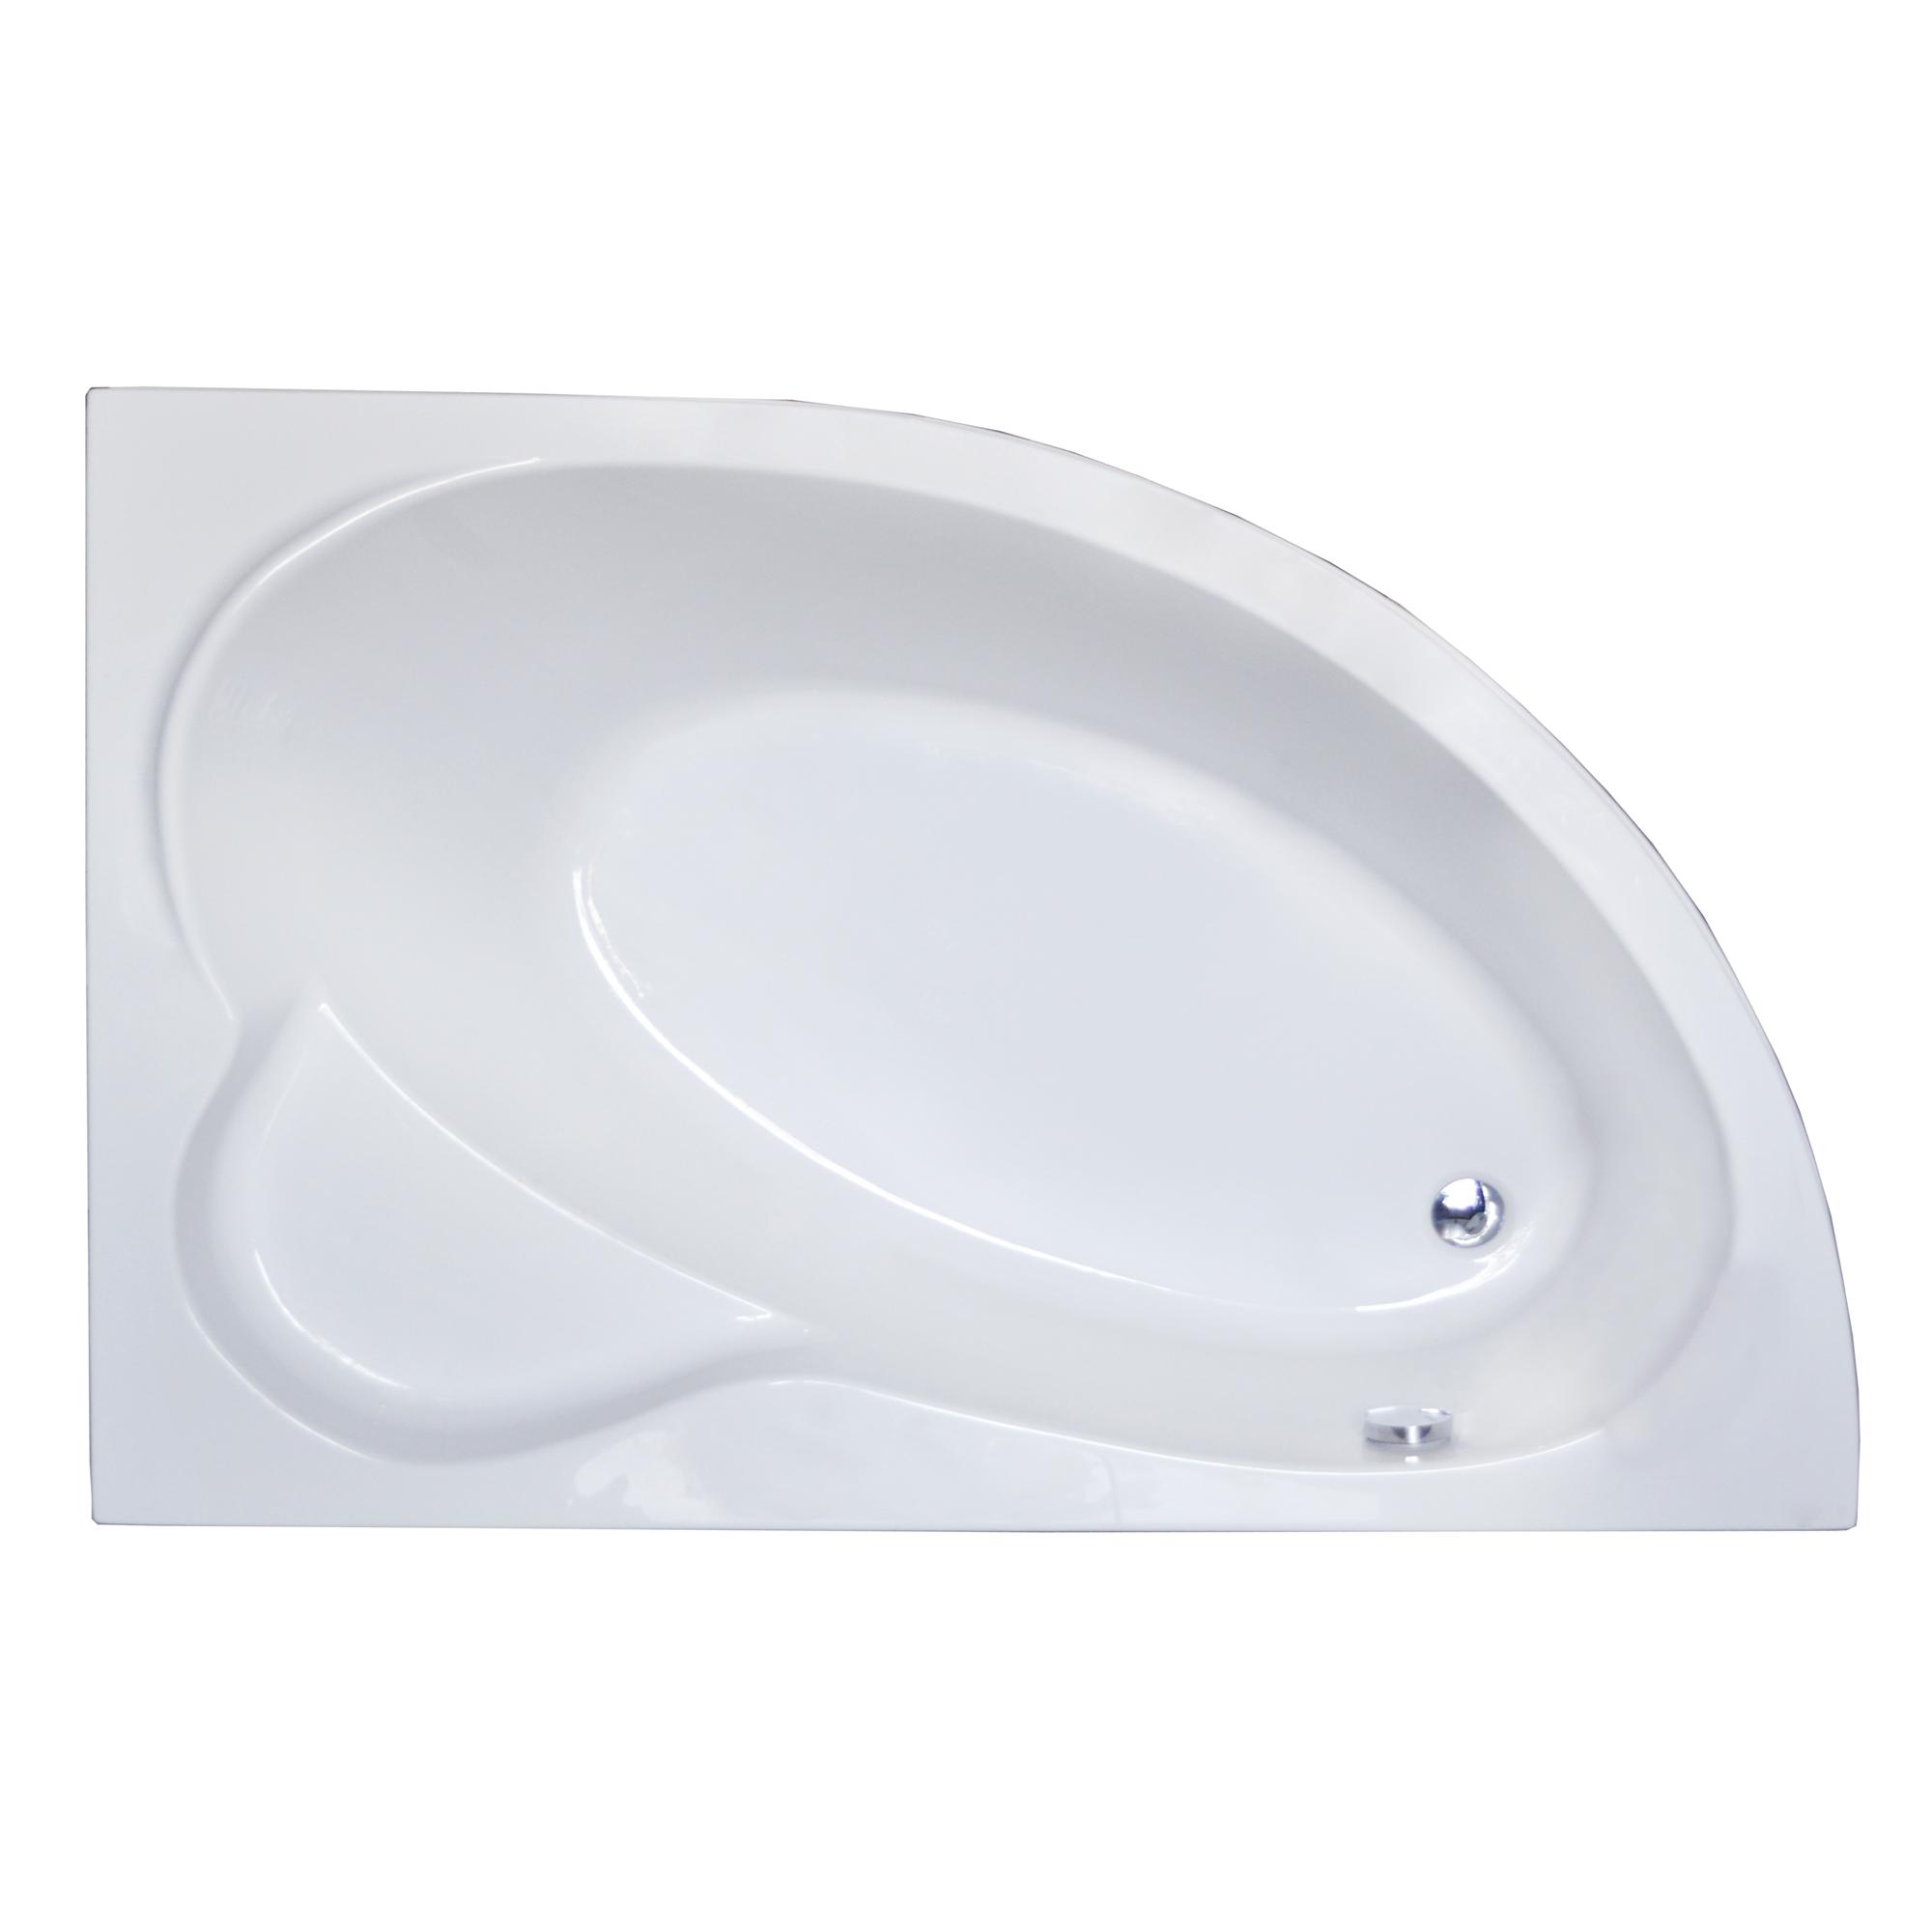 Акриловая ванна Royal bath Alpine RB819103 140х95 R панель фронтальная к ванне royal bath alpine 170 rb819102p